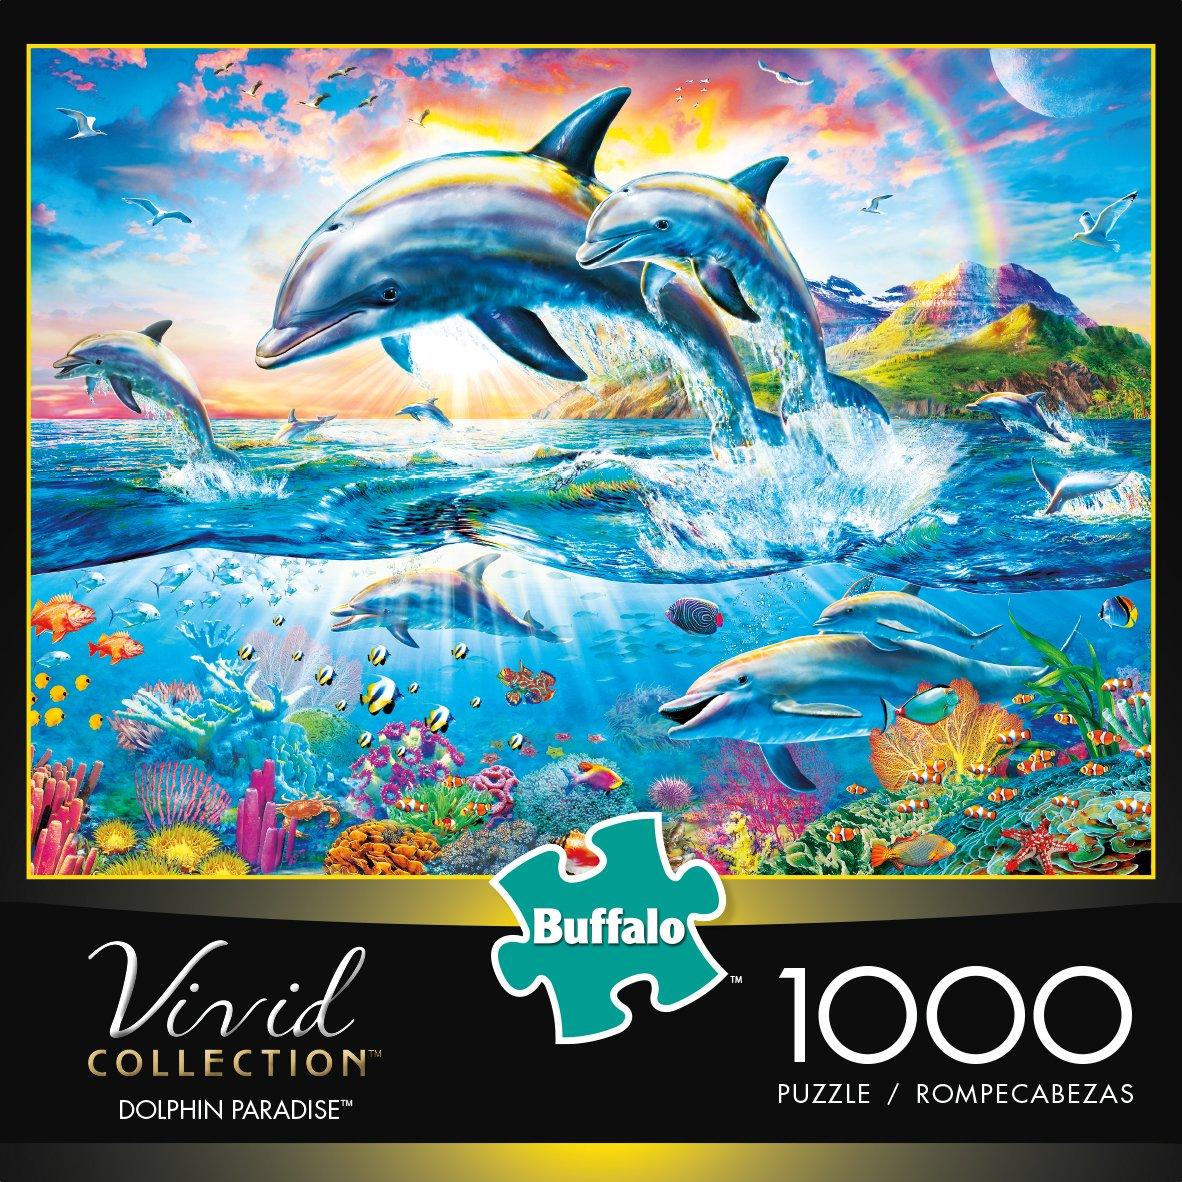 1000-Piece Buffalo Games Jigsaw Puzzle - Vivid Collection - Dolphin Paradise - $7.00 @ Amazon + FSSS